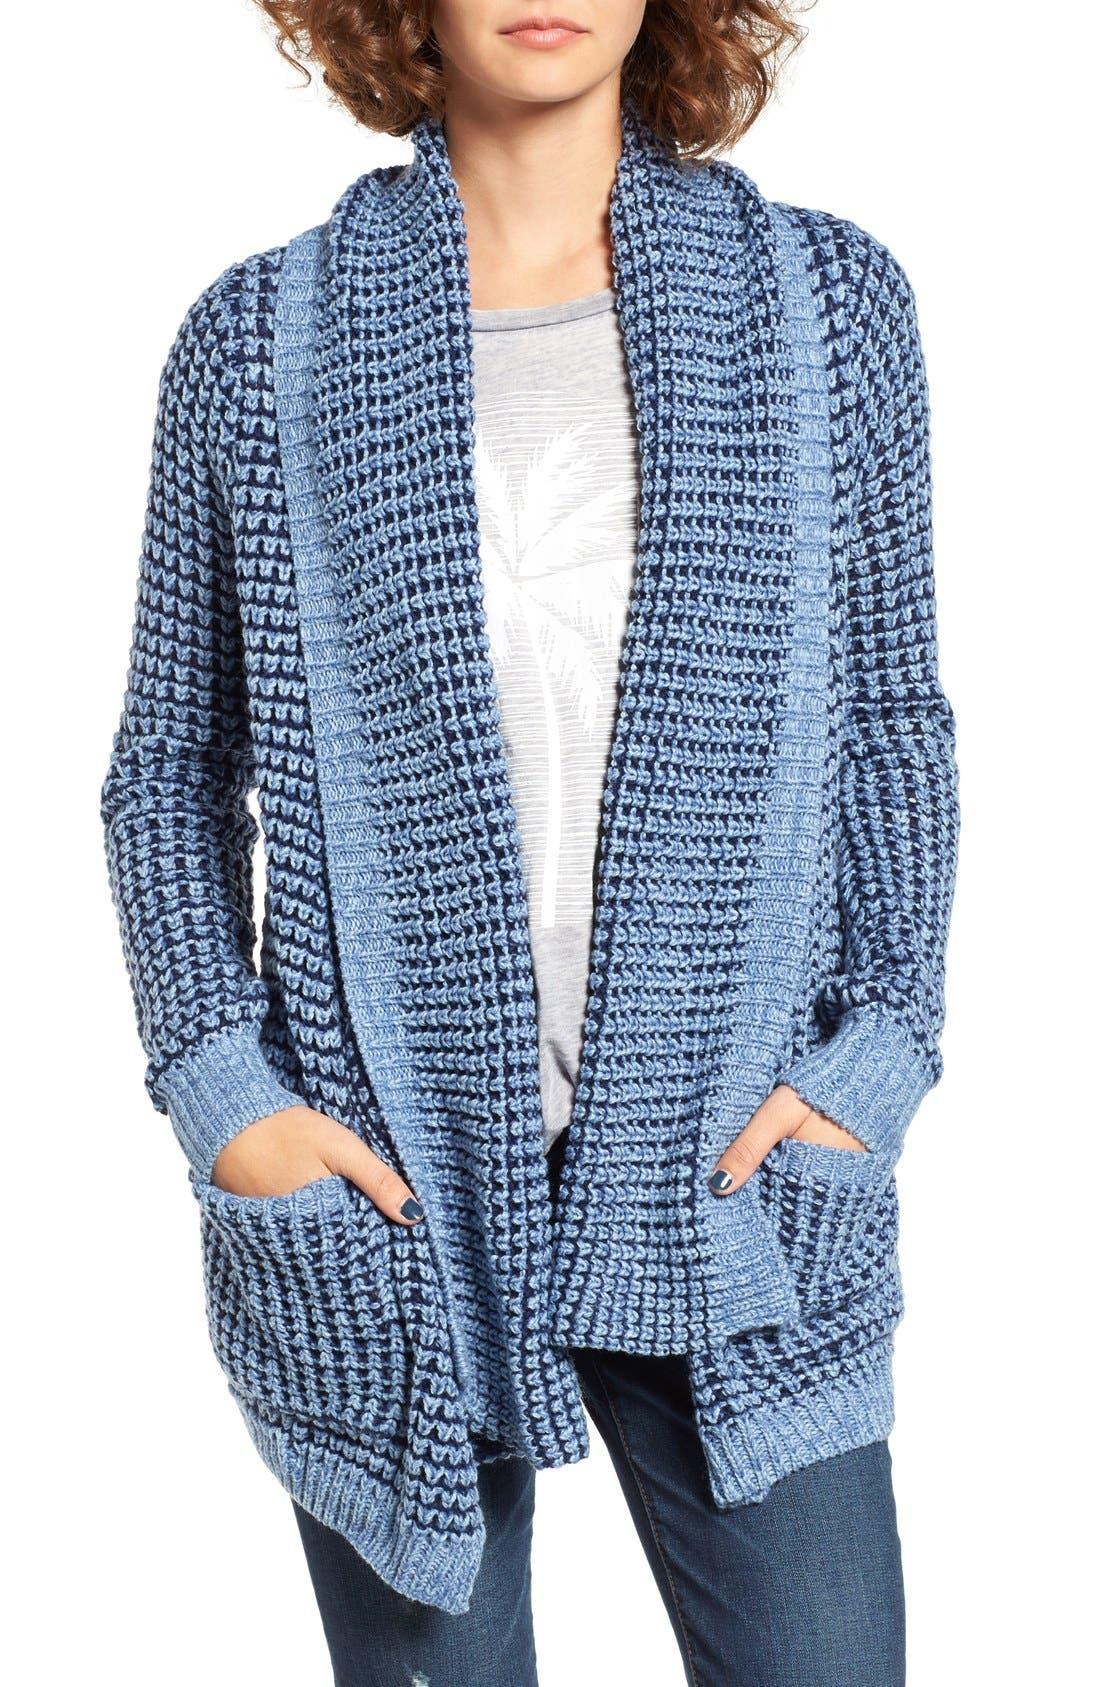 Main Image - Rip Curl Shambala Knit Cardigan